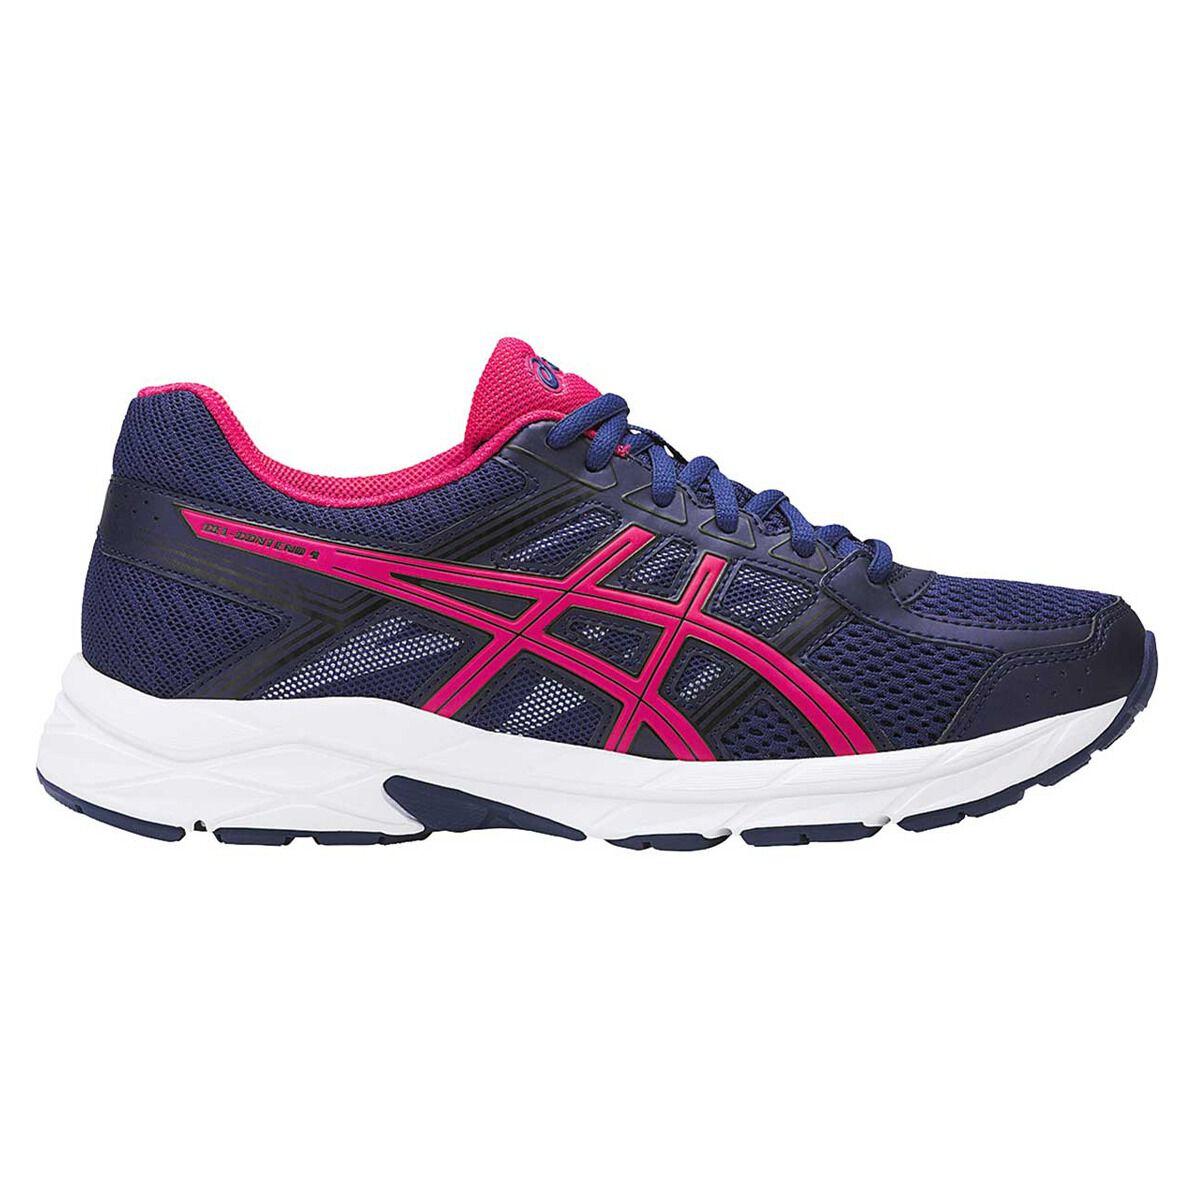 Contend Gel 4 Running Shoes Asics Womens 1Fcl3KTJ